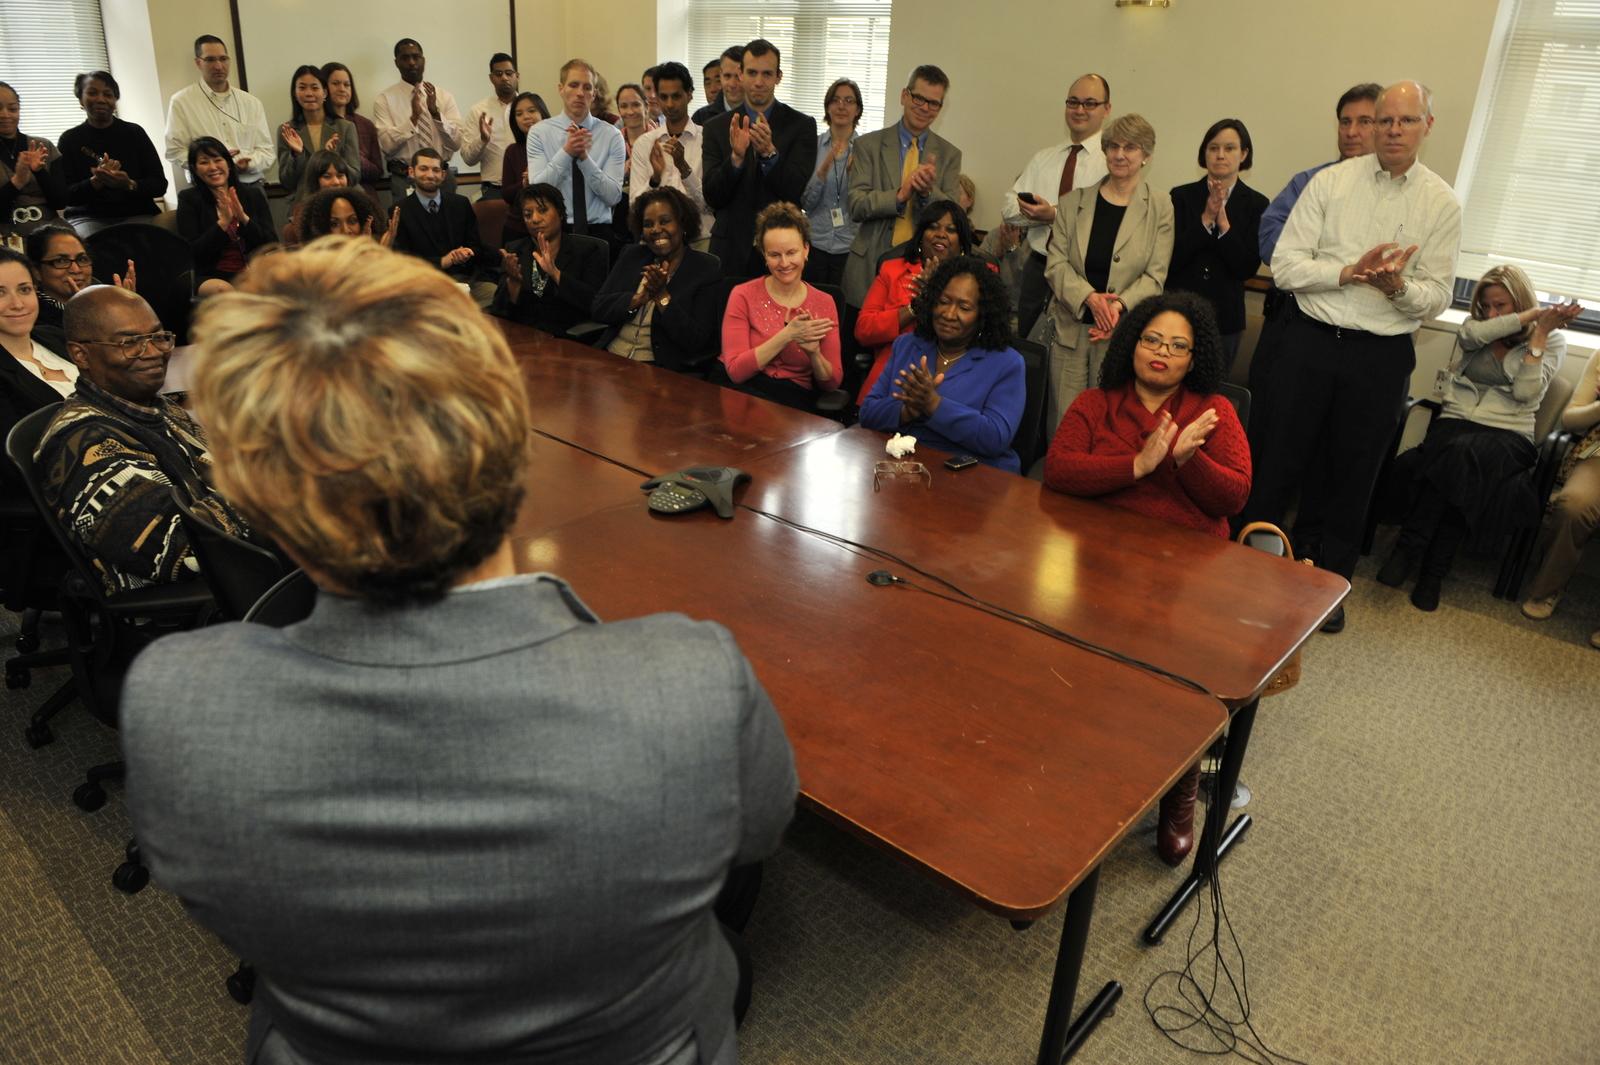 Office of the Administrator - Lisa Jackson's Farewell Tour [412-APD-1115-2013-02-07_FarewellTour_178.JPG]